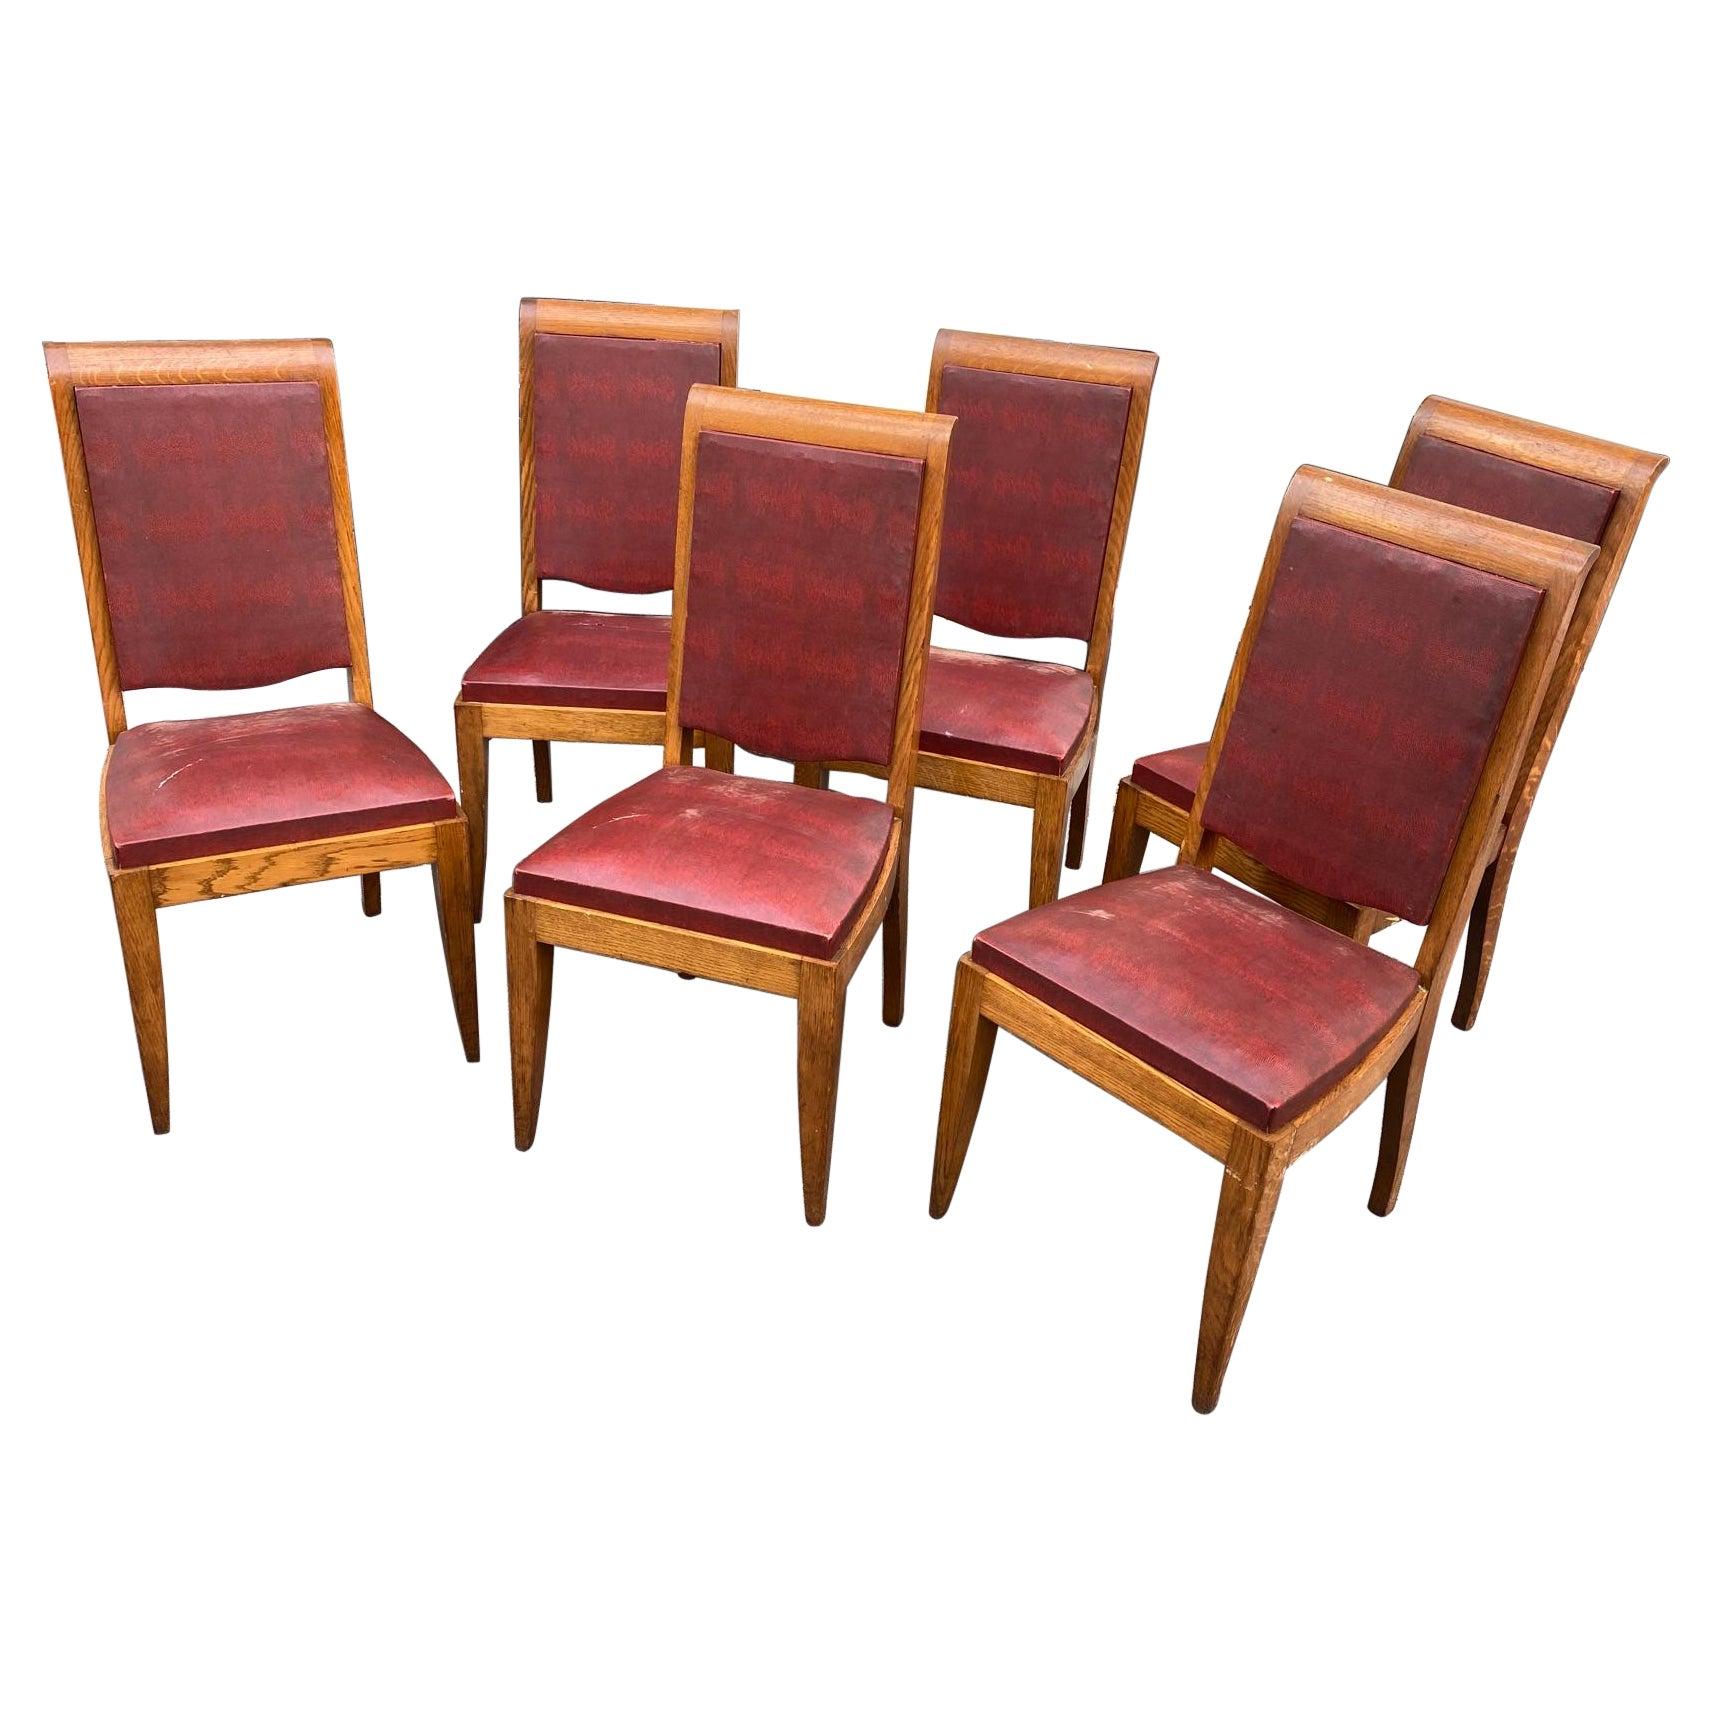 Gaston Poisson, Set of Six Art Deco Chairs in Oak, circa 1930/1940